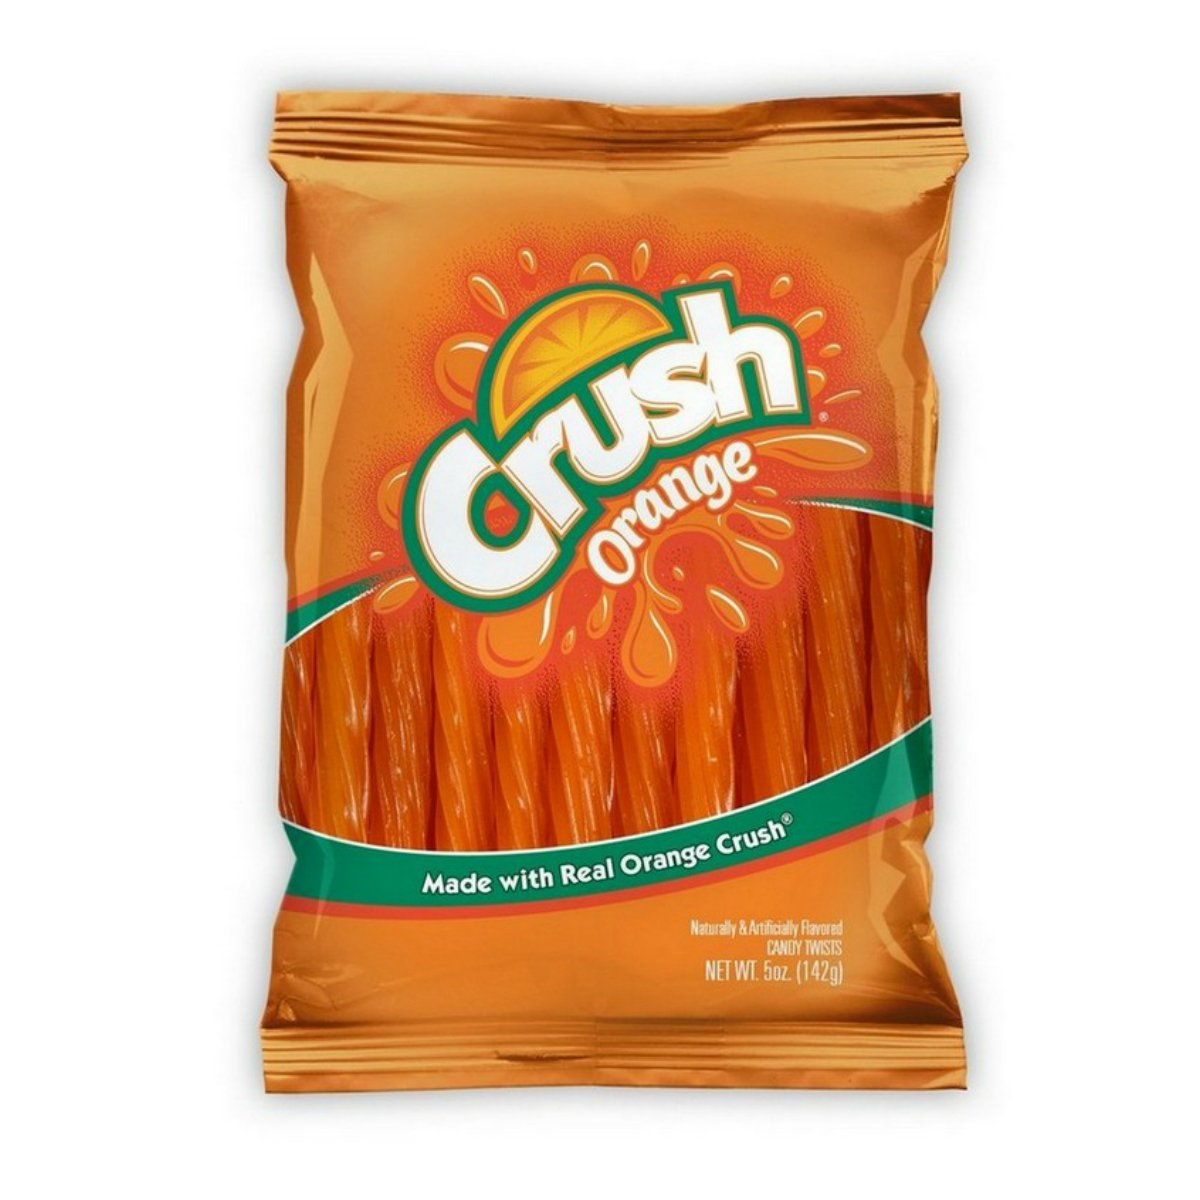 Kenny's Juicy Licorice Twists 5 oz Bag - Choose Any Flavor (Orange Crush)